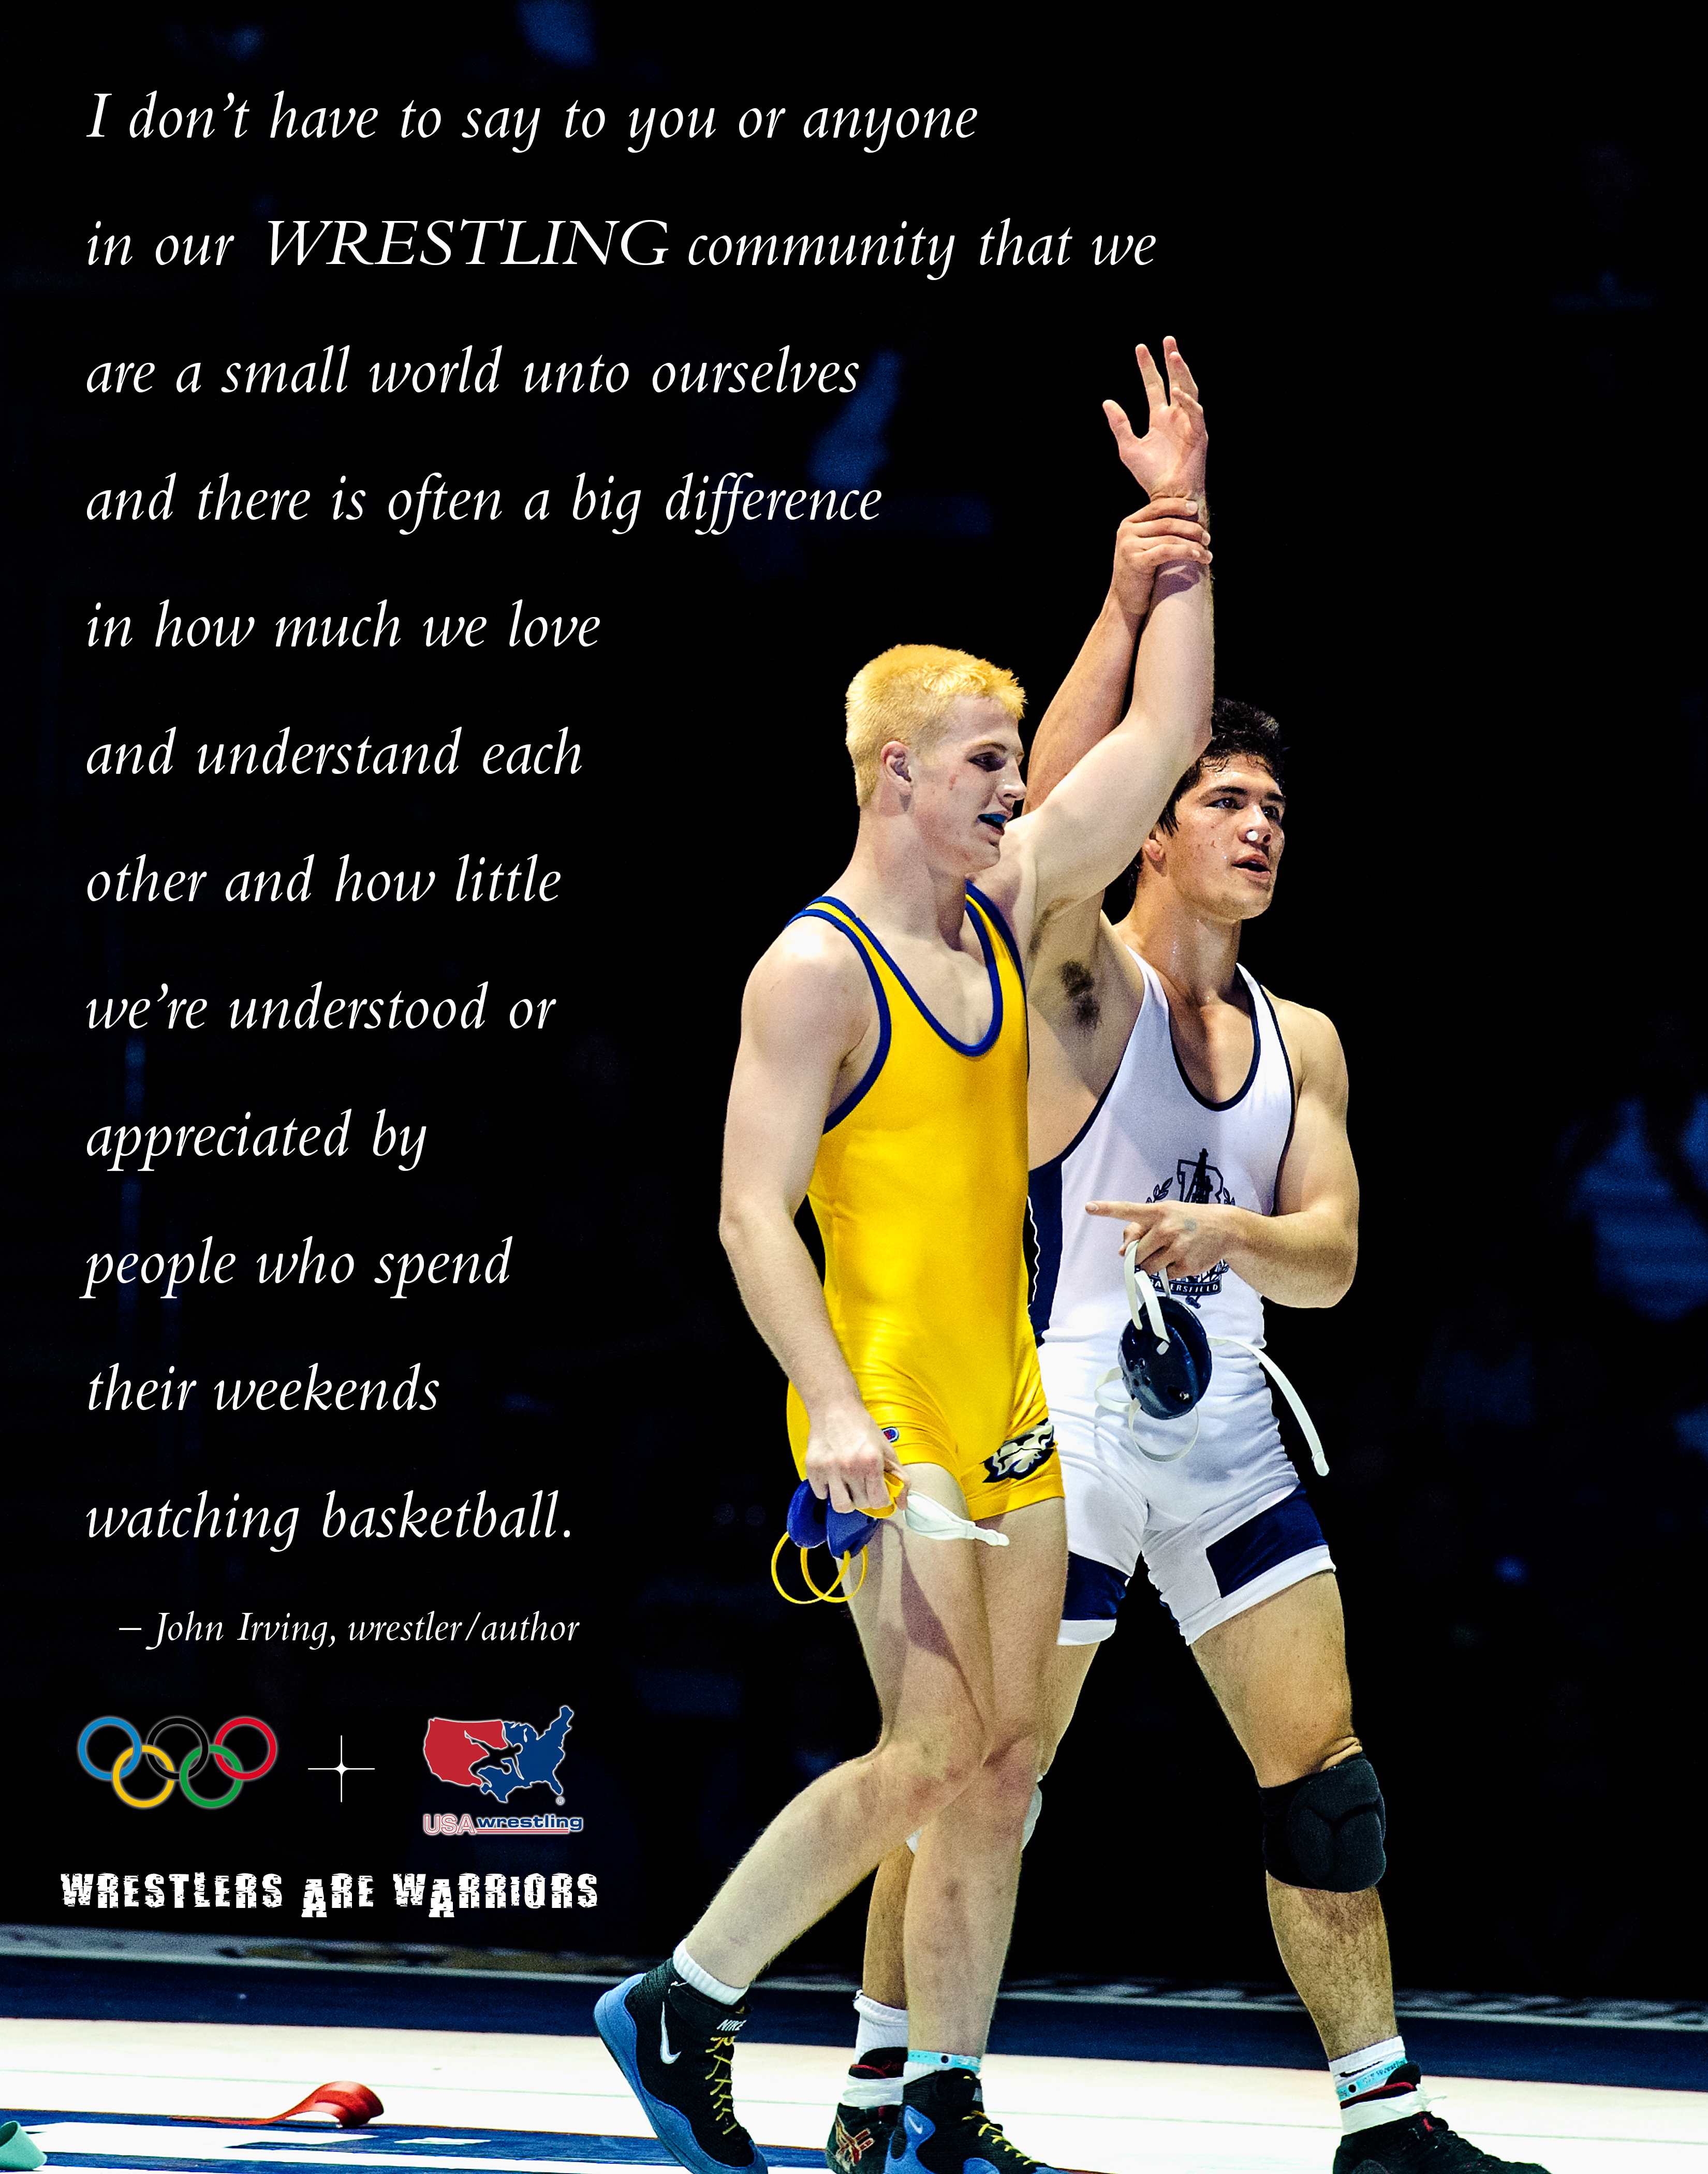 Wrestler quote #1